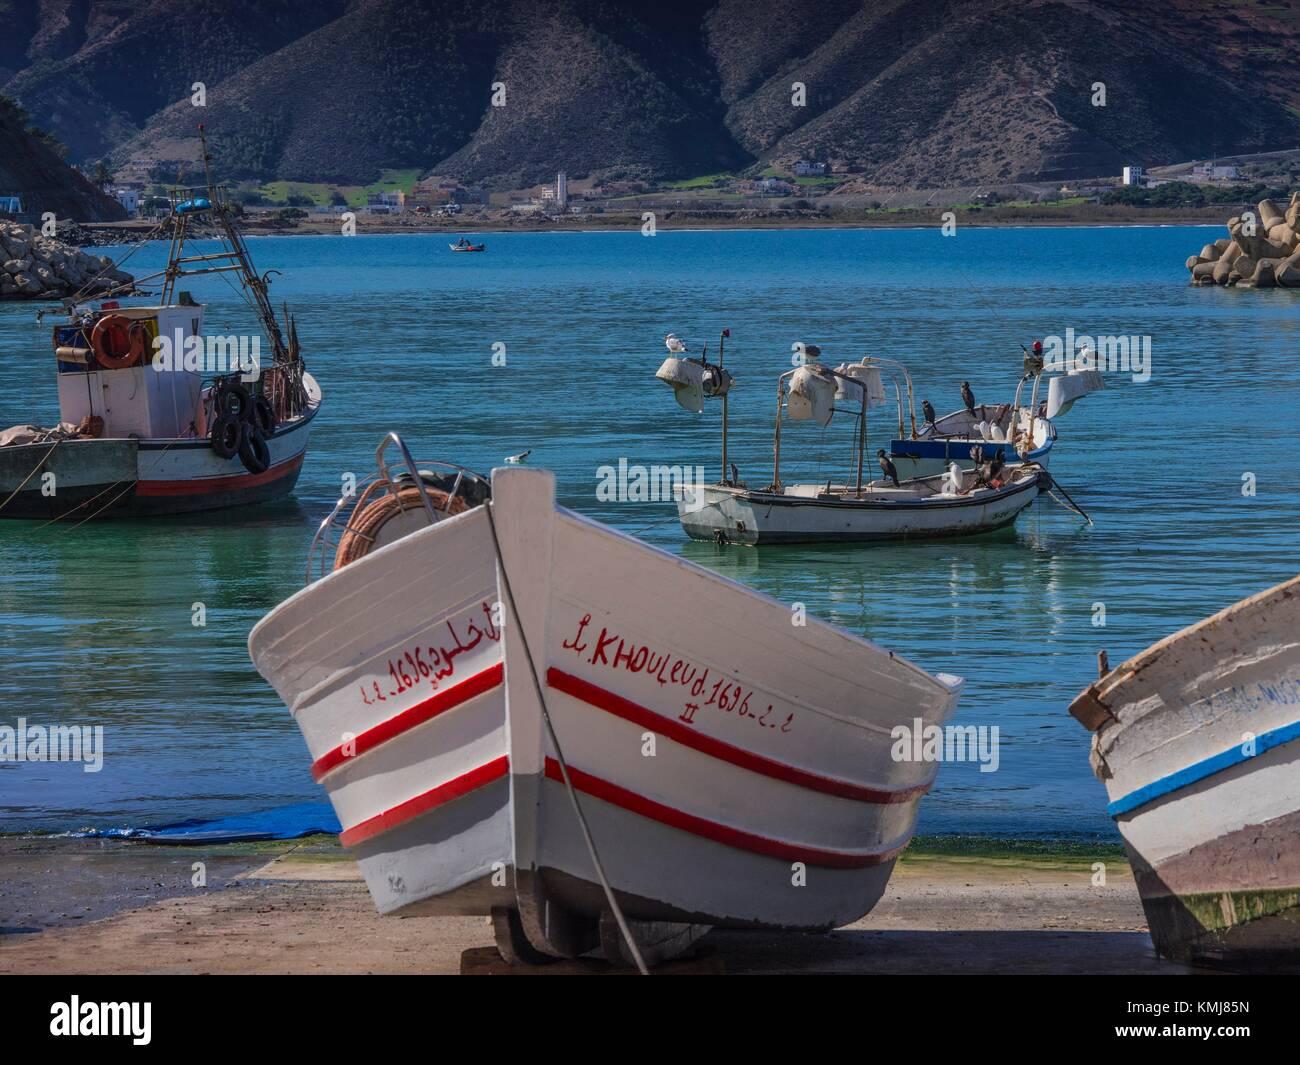 Morocco, at Sheba, on the northern Mediterranean coast. - Stock Image